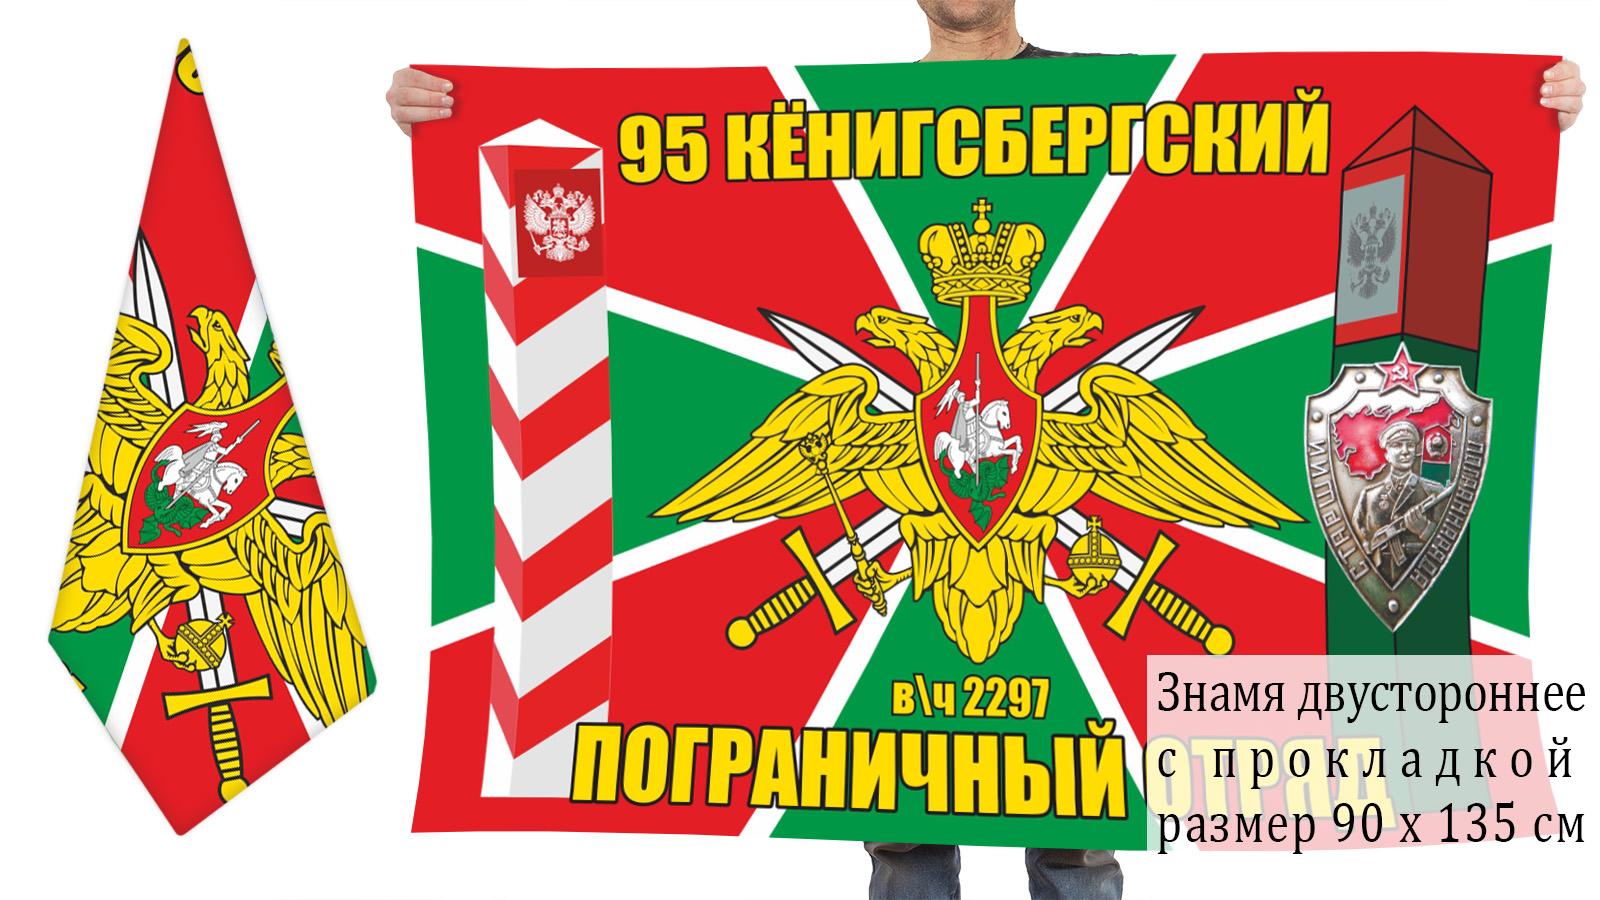 Двусторонний флаг 95 Кёнигсбергского пограничного отряда